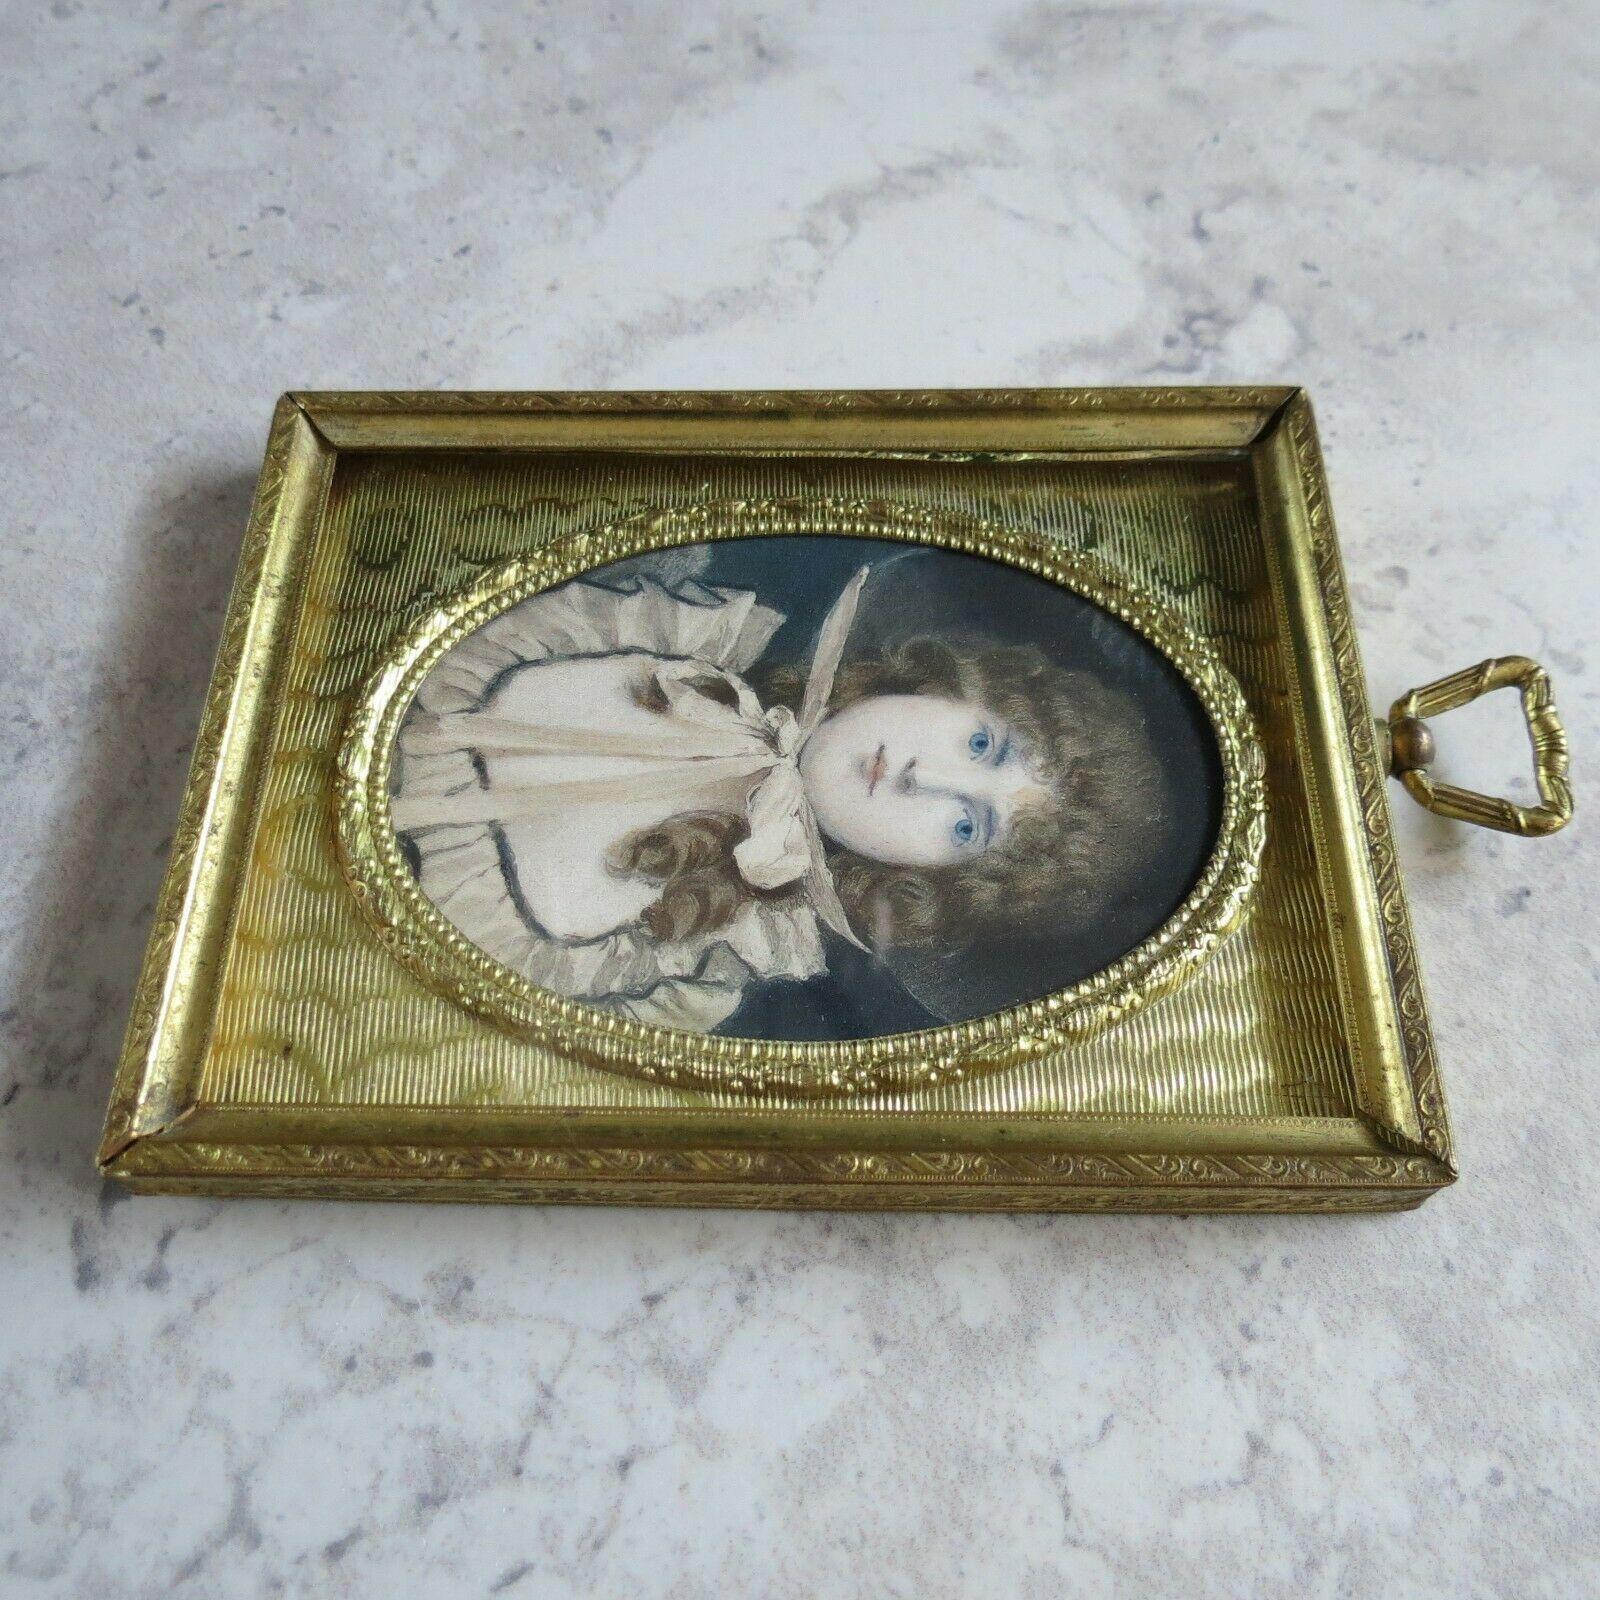 Antique Gold metal Frame Celluloid Miniature Portrait lithograph hand colored